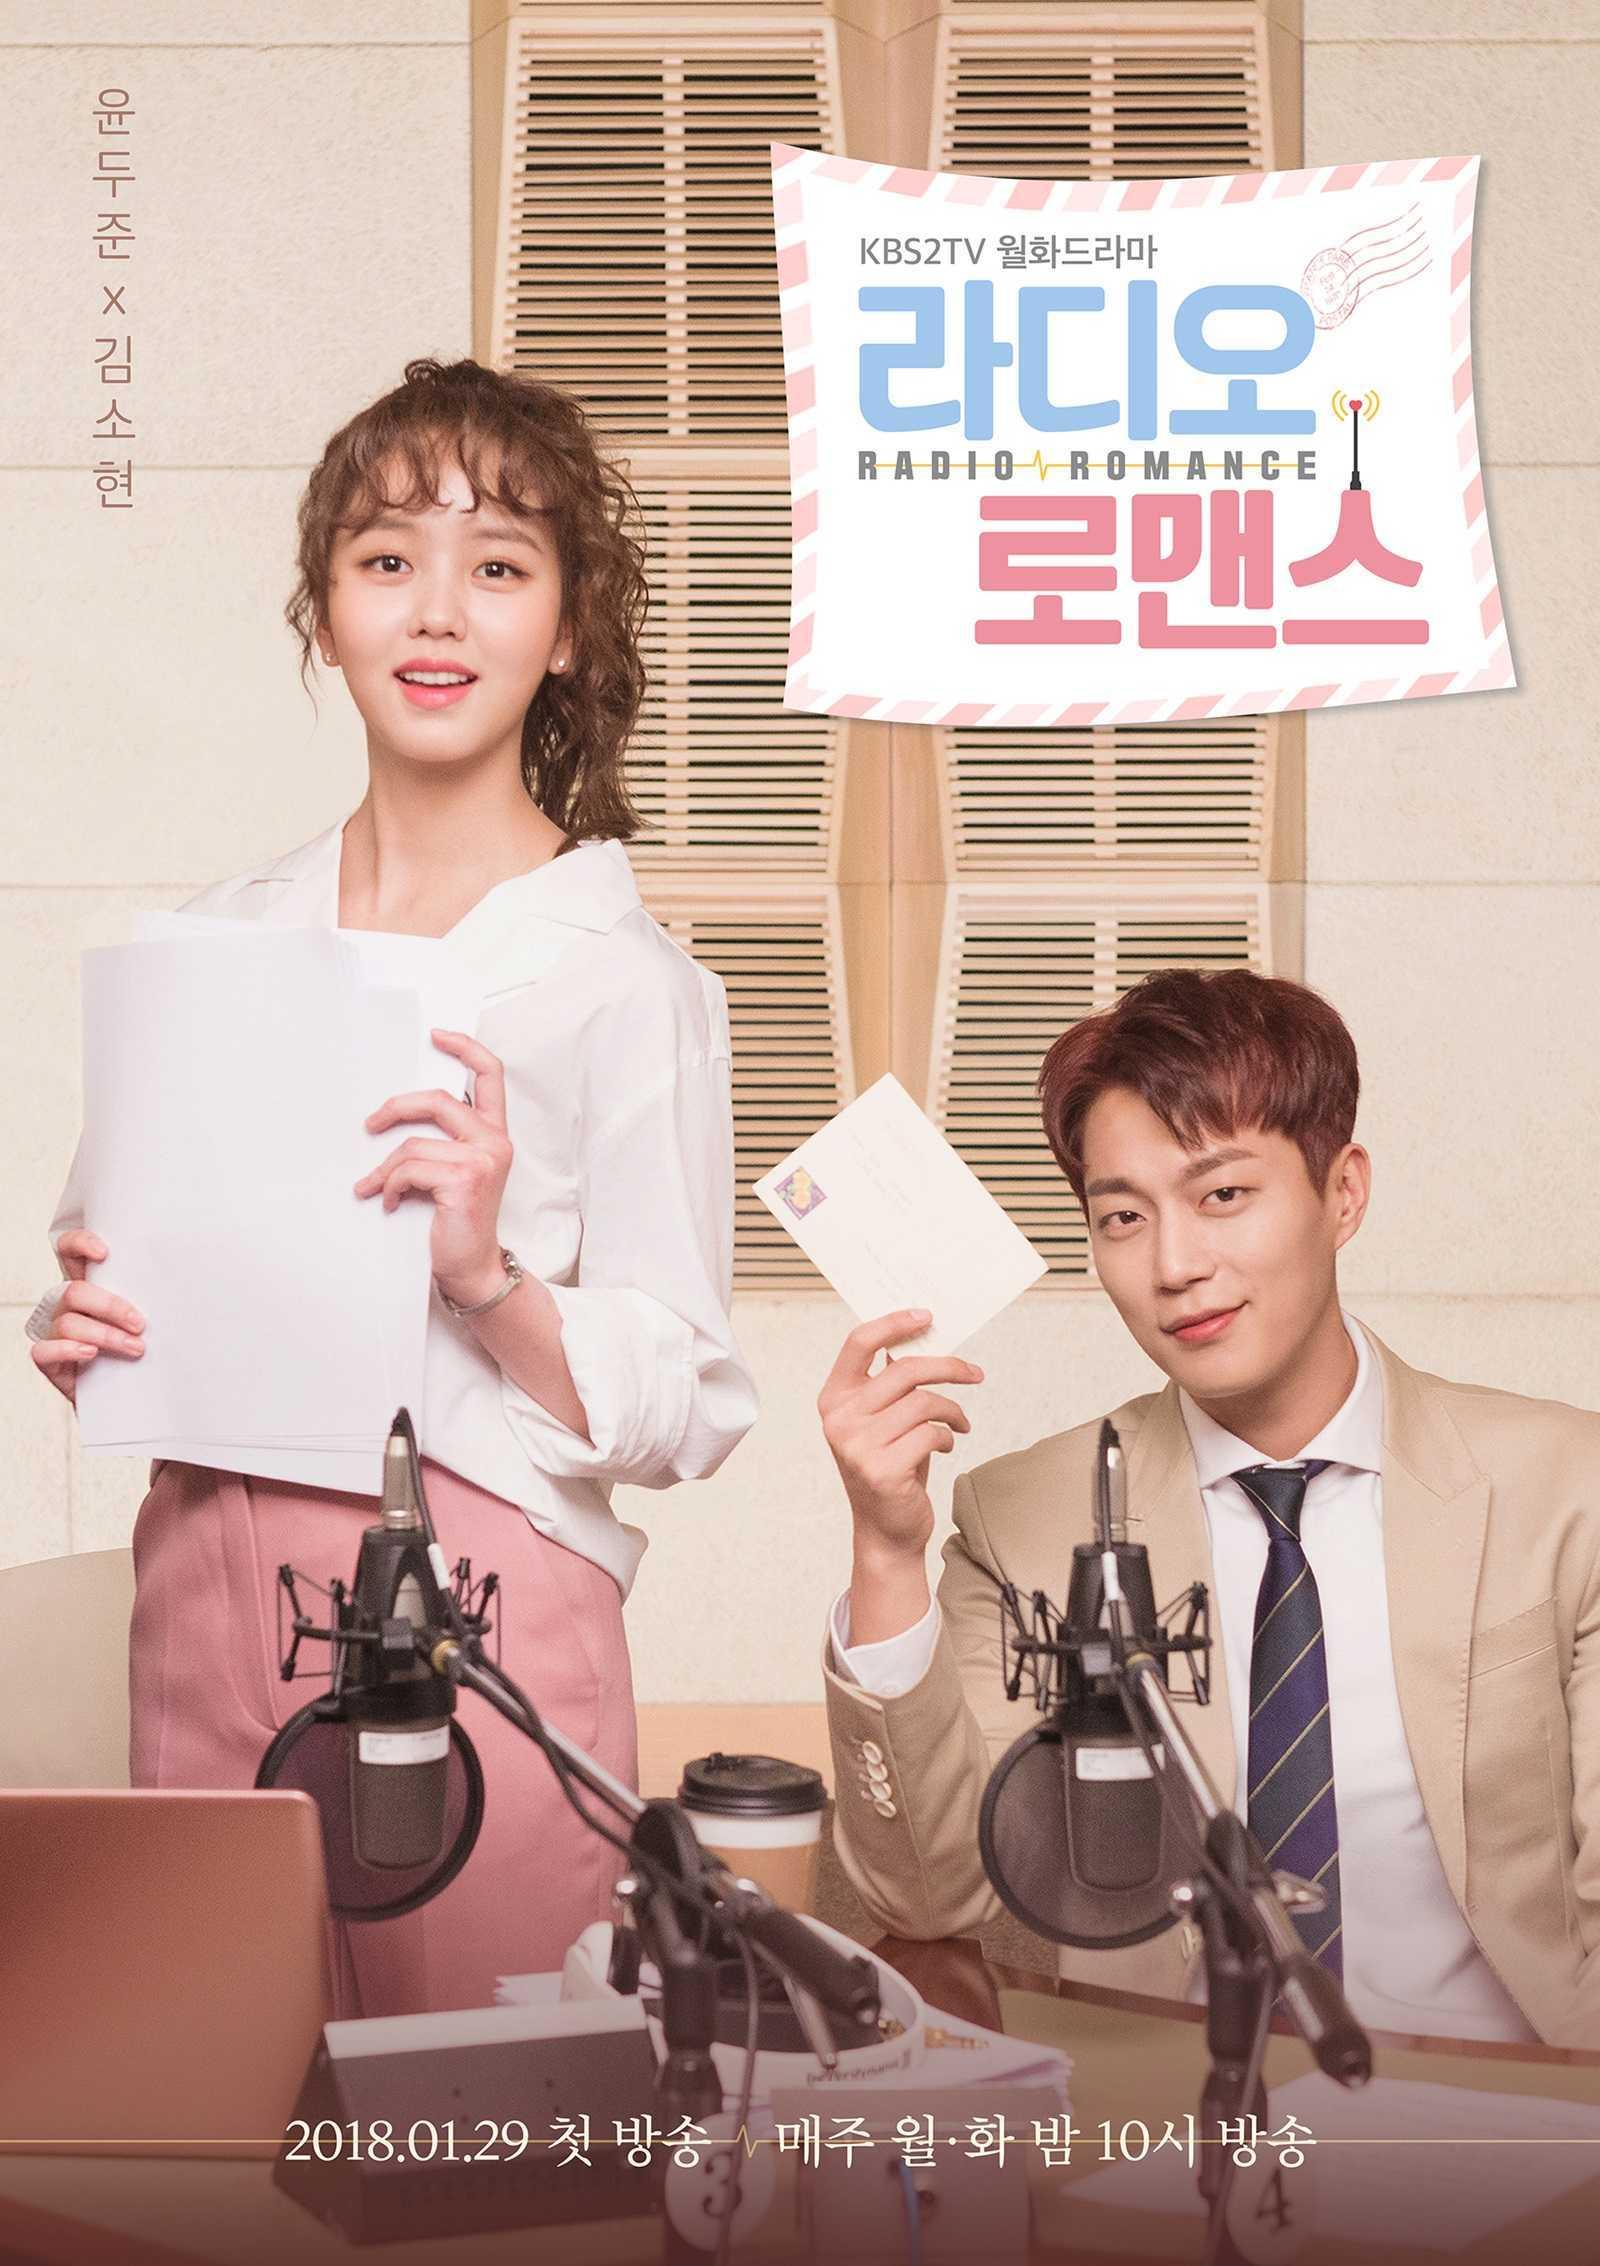 radio-romance-ตื้อหัวใจนายจอมหยิ่ง-พากย์ไทย-ตอนที่-1-16-จบ-